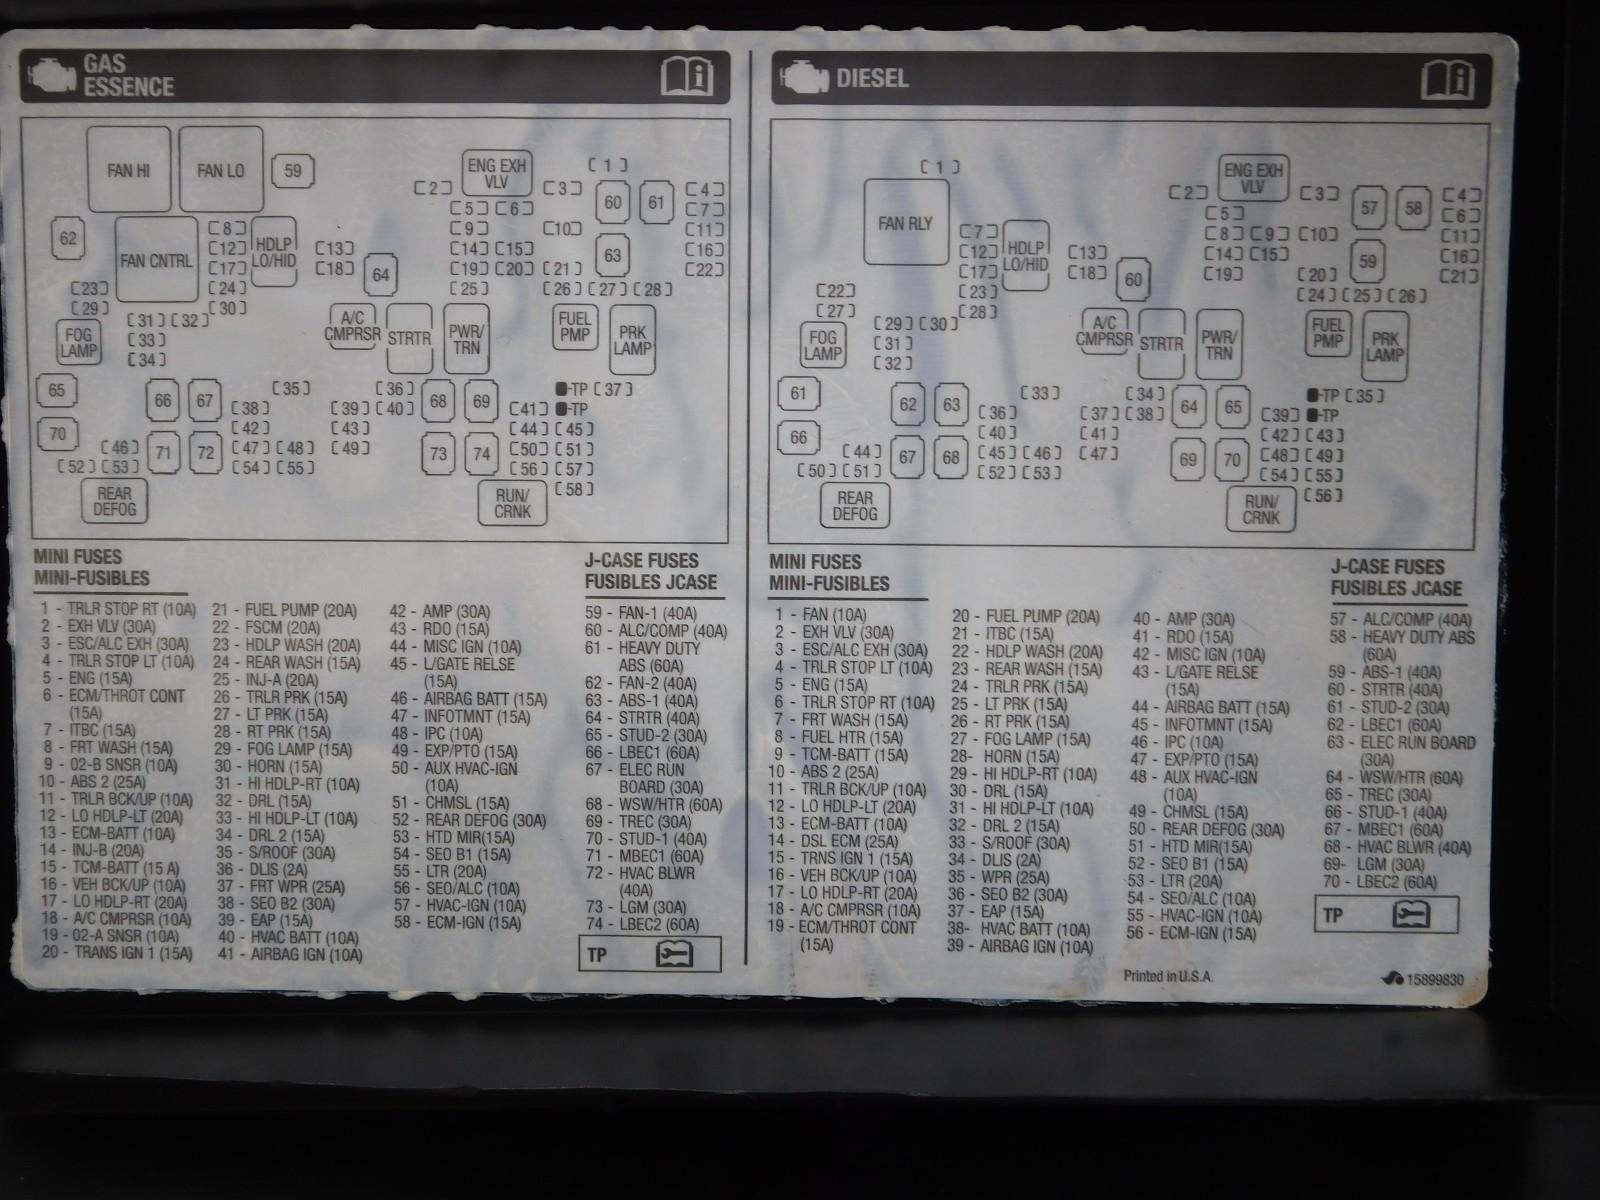 2008 gmc sierra 2500hd fuse box diagram gmc junction engine fuse box wires